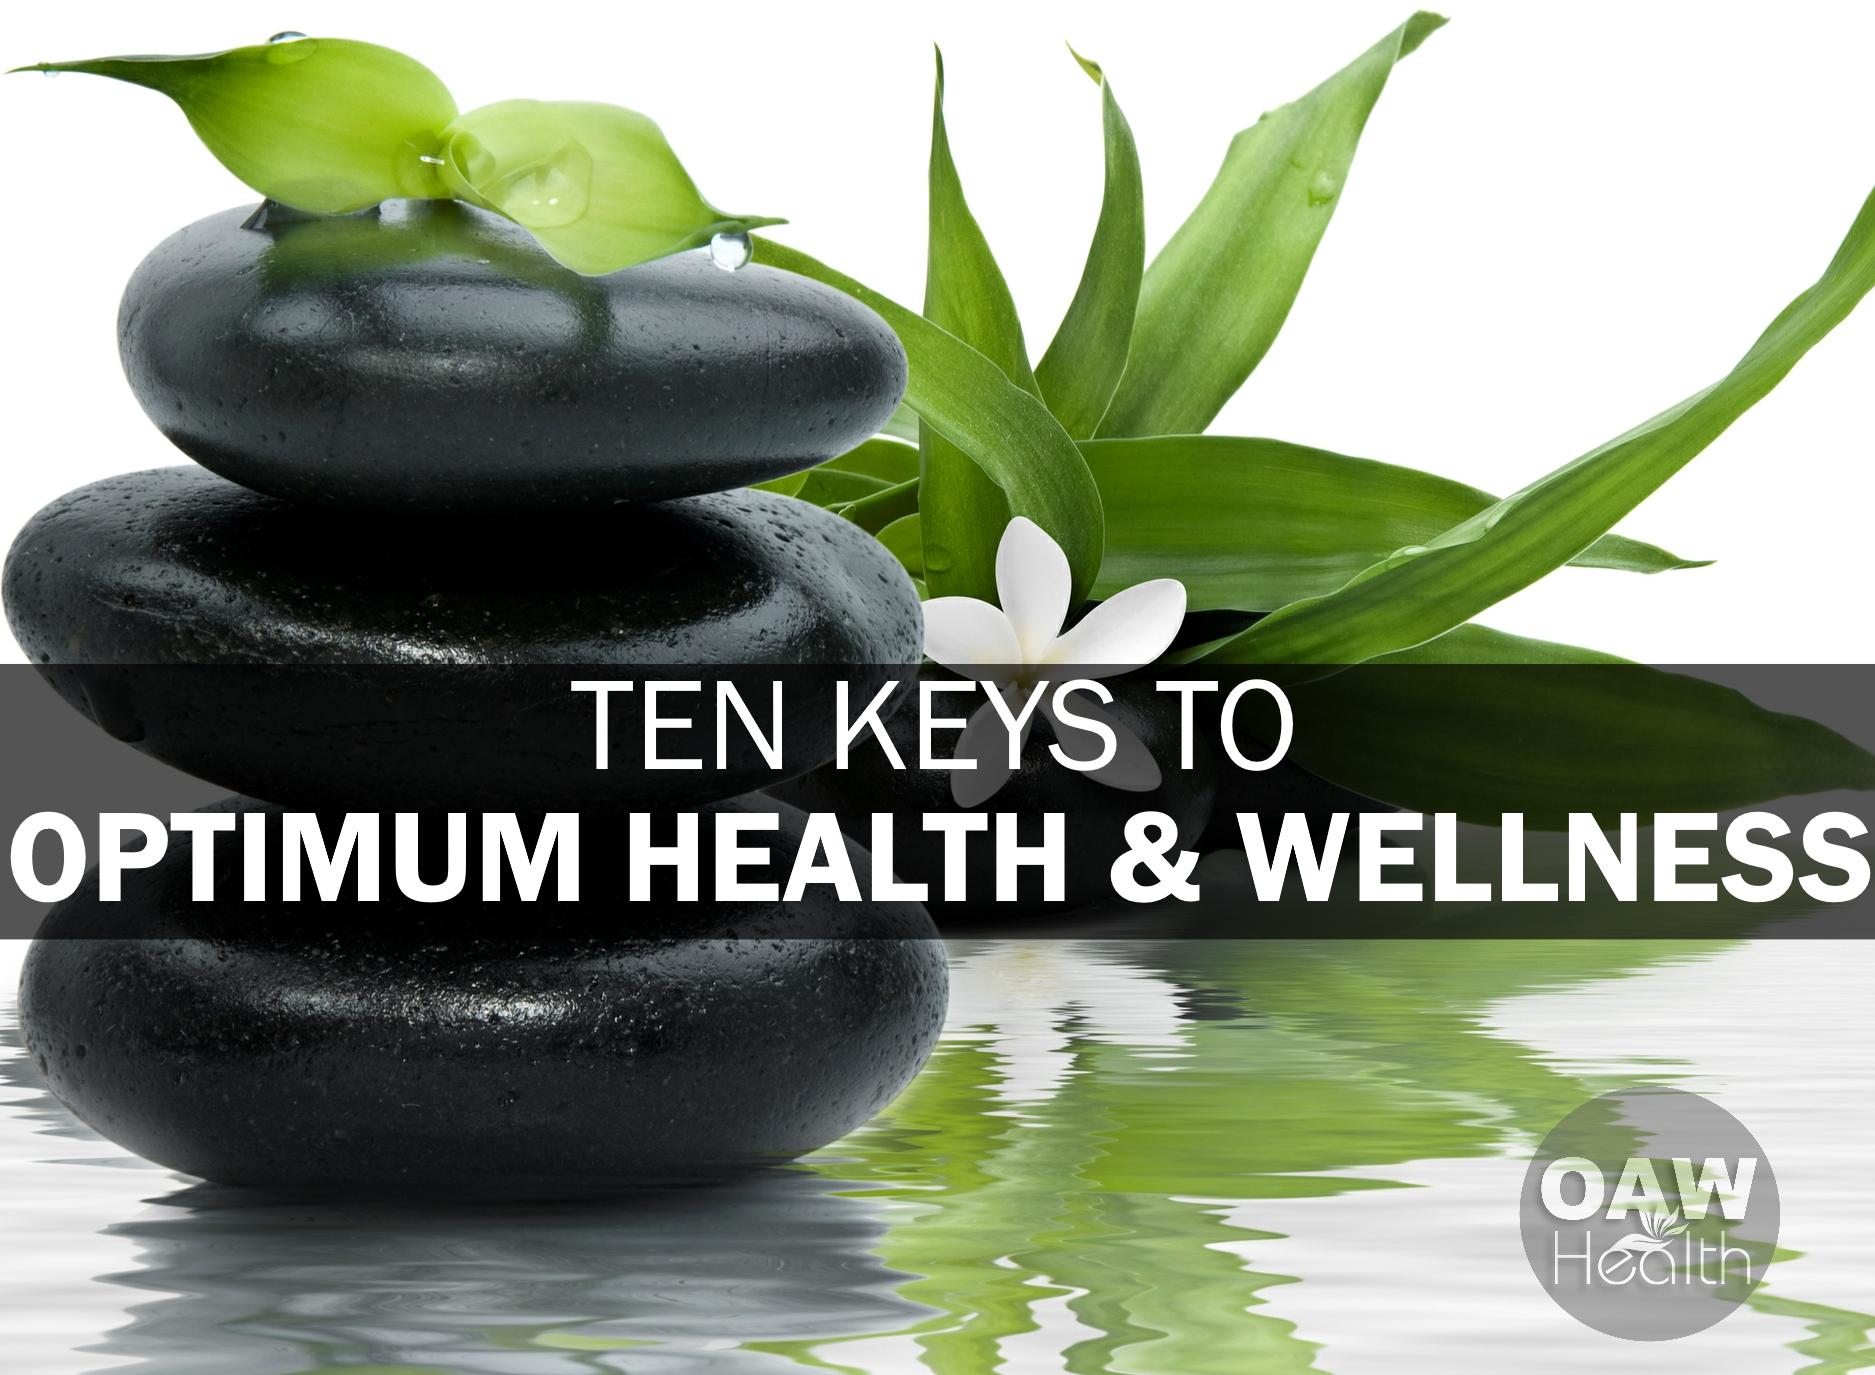 Ten Keys to Optimum Health and Wellness